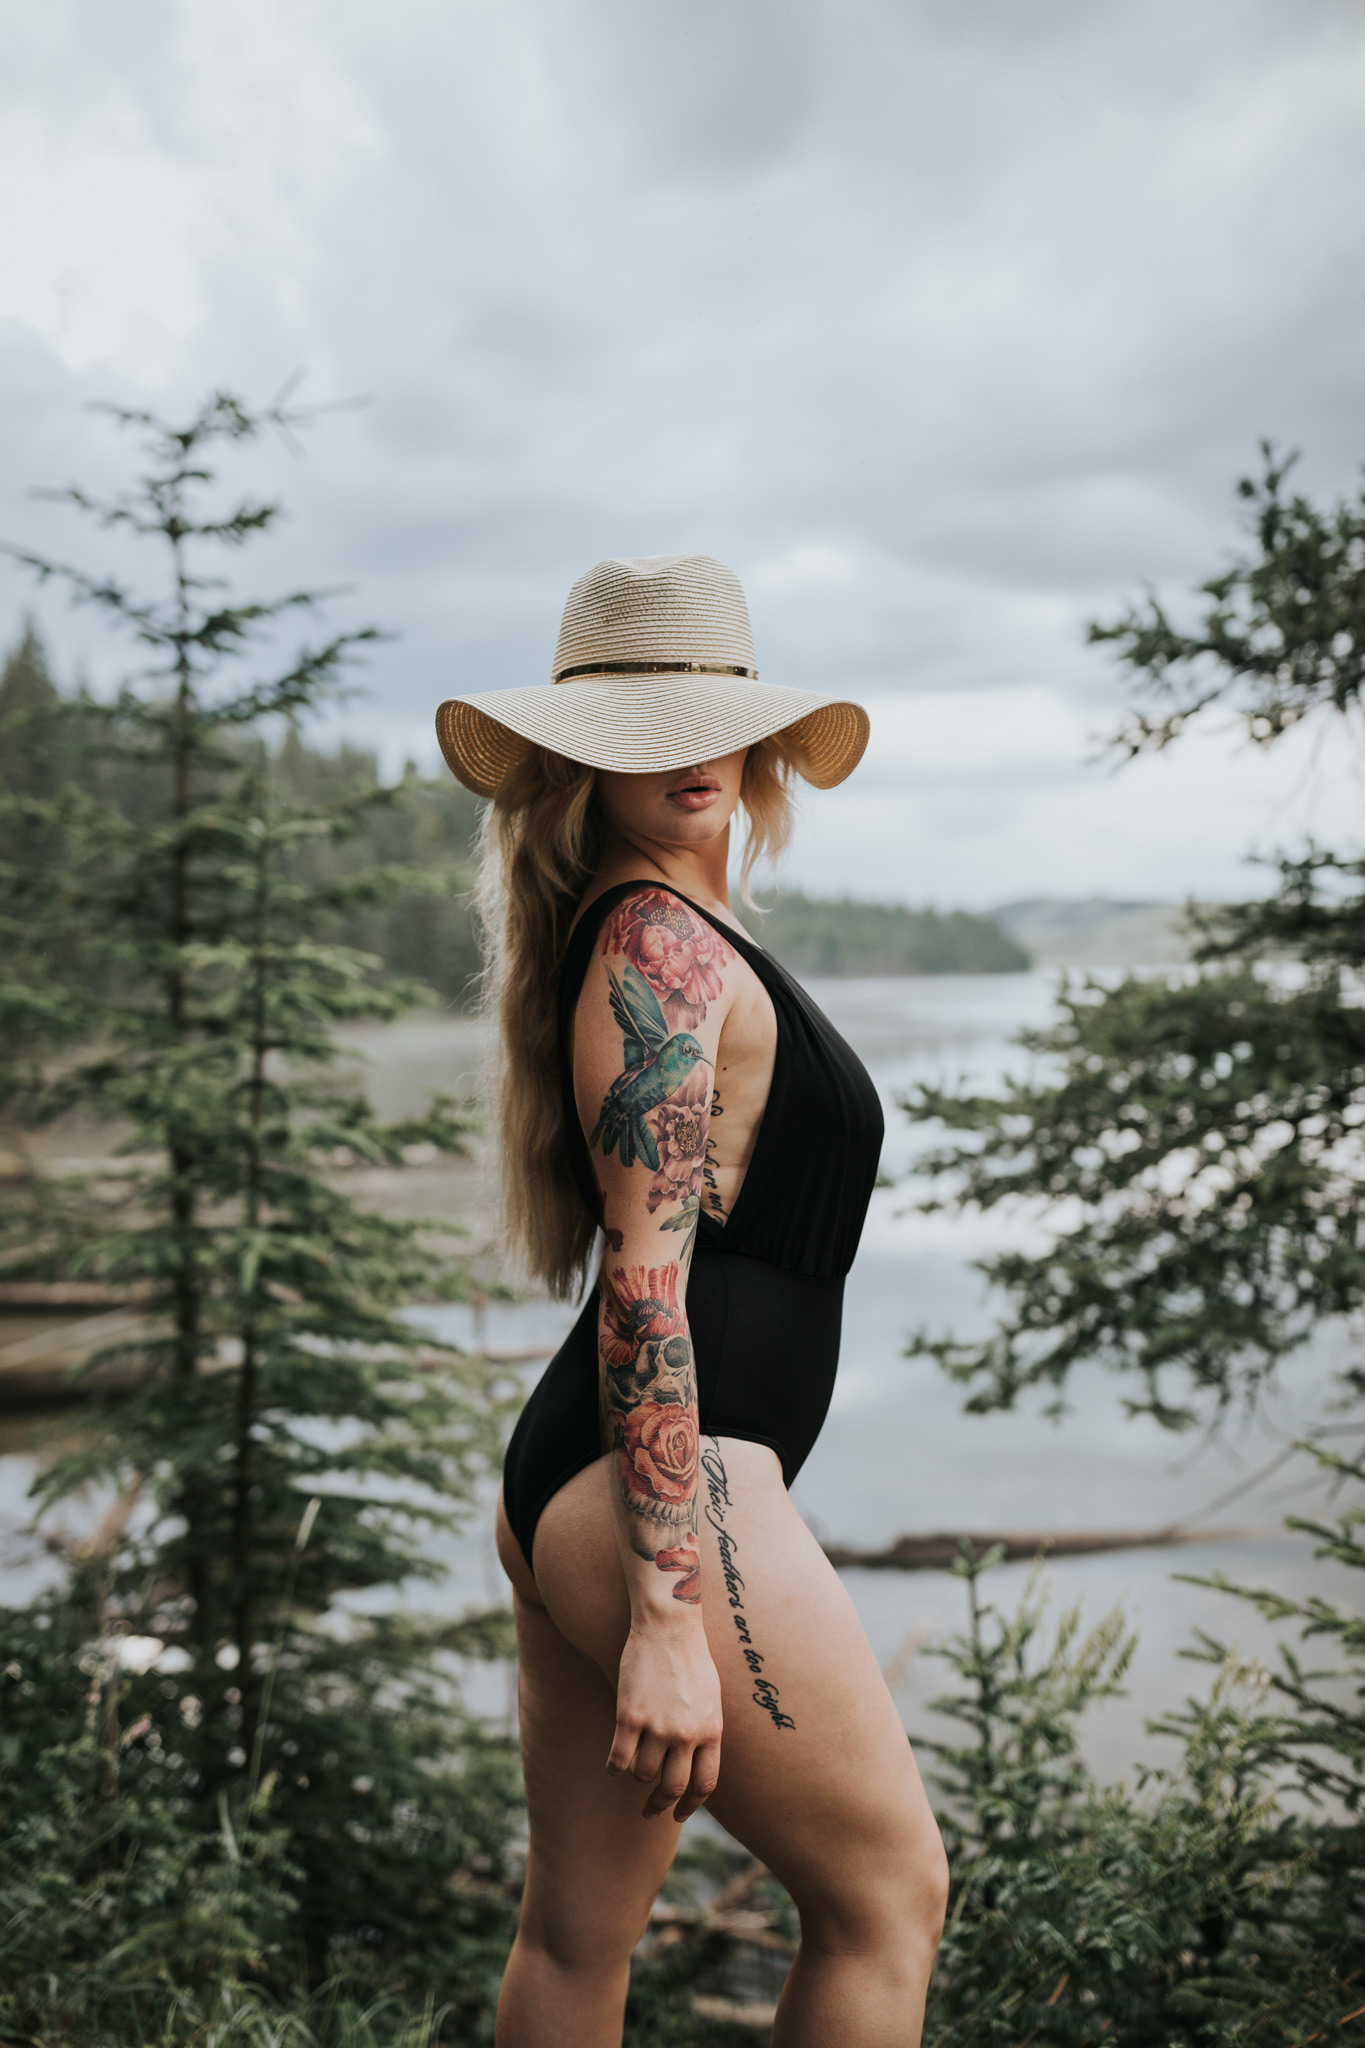 woman posing by reesor lake wearing floppy hat covering eyes